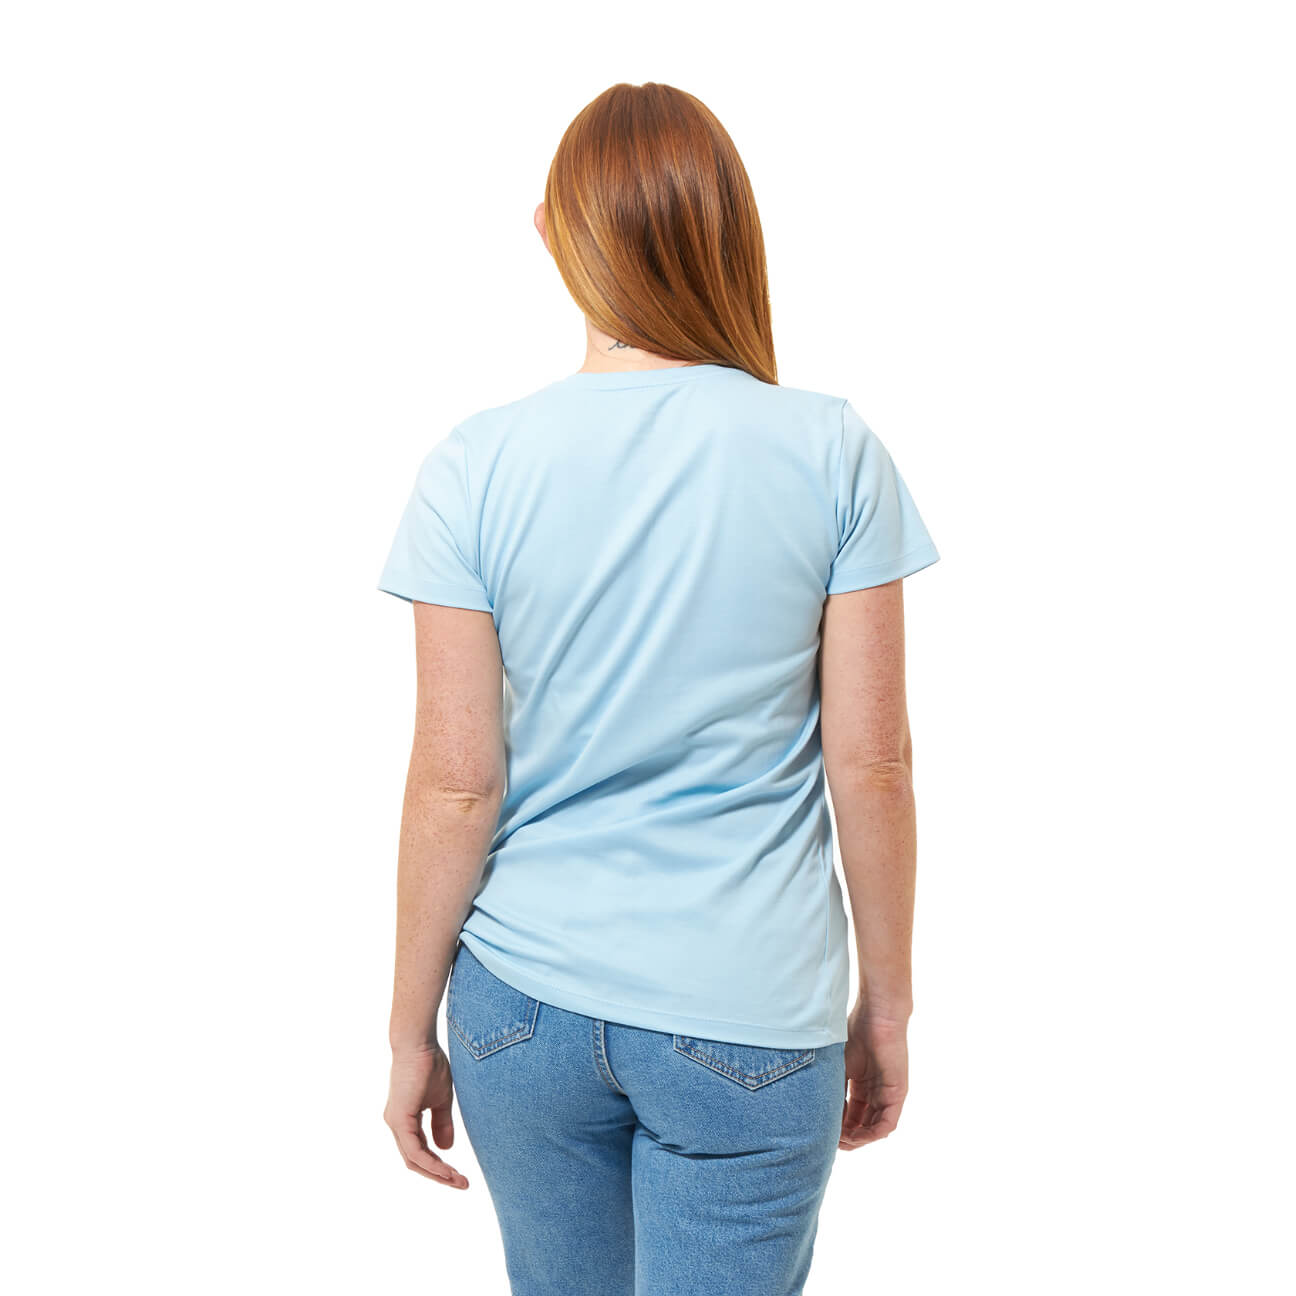 Franela basica dama cuello redondo azul claro espalda